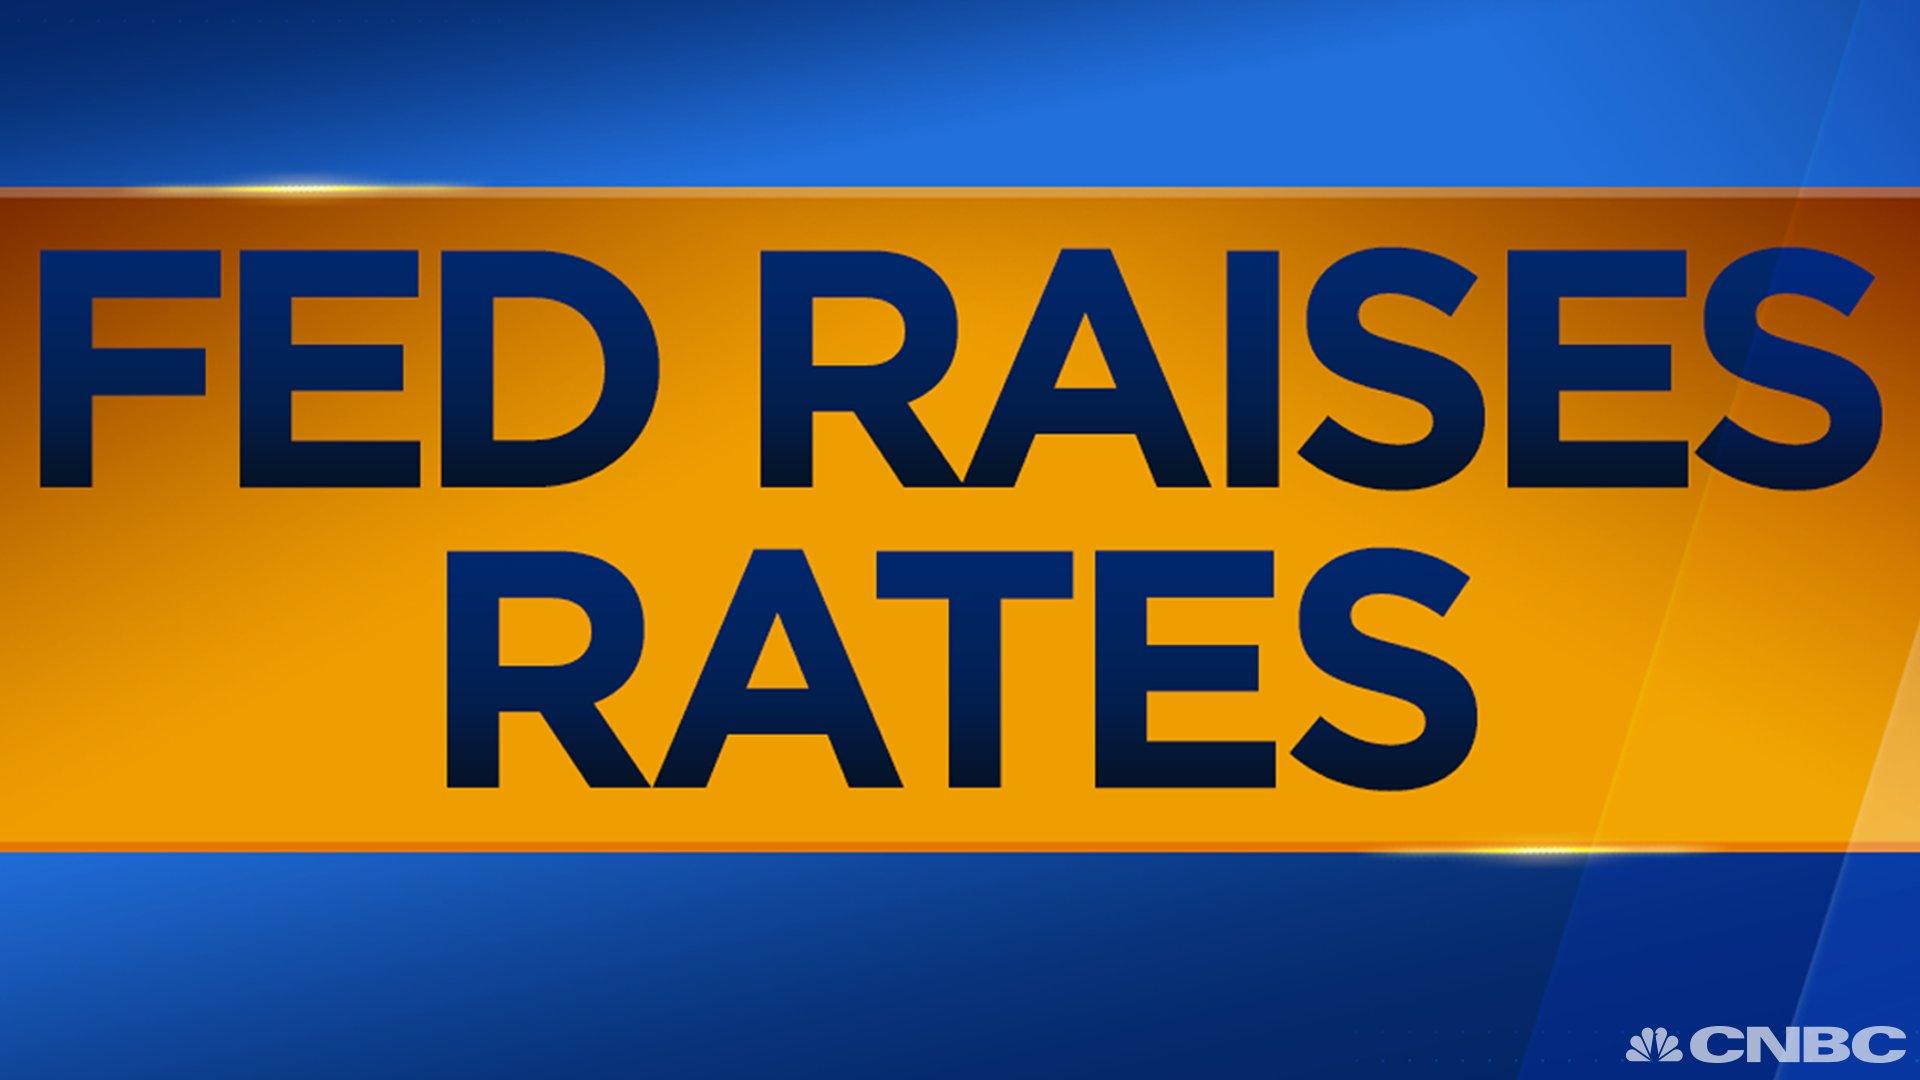 BREAKING: Federal Reserve raises rates  https://t.co/PU1jg9b176 https://t.co/icApxTHXyx